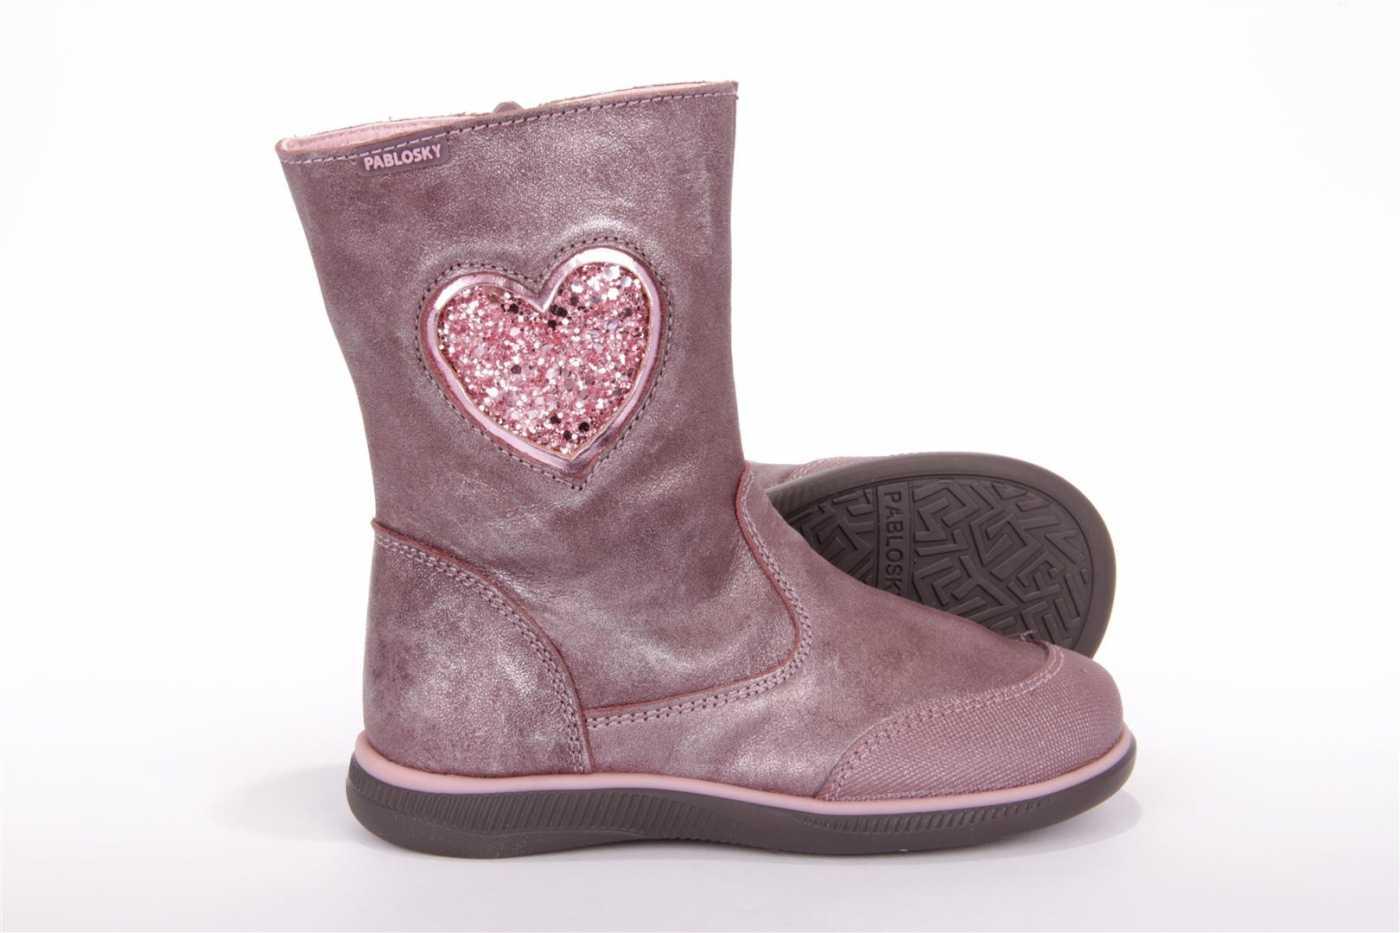 31b4cca01c6 Comprar zapato tipo JOVEN NIÑA estilo BOTINES-BOTA ALTA COLOR ROSA ...